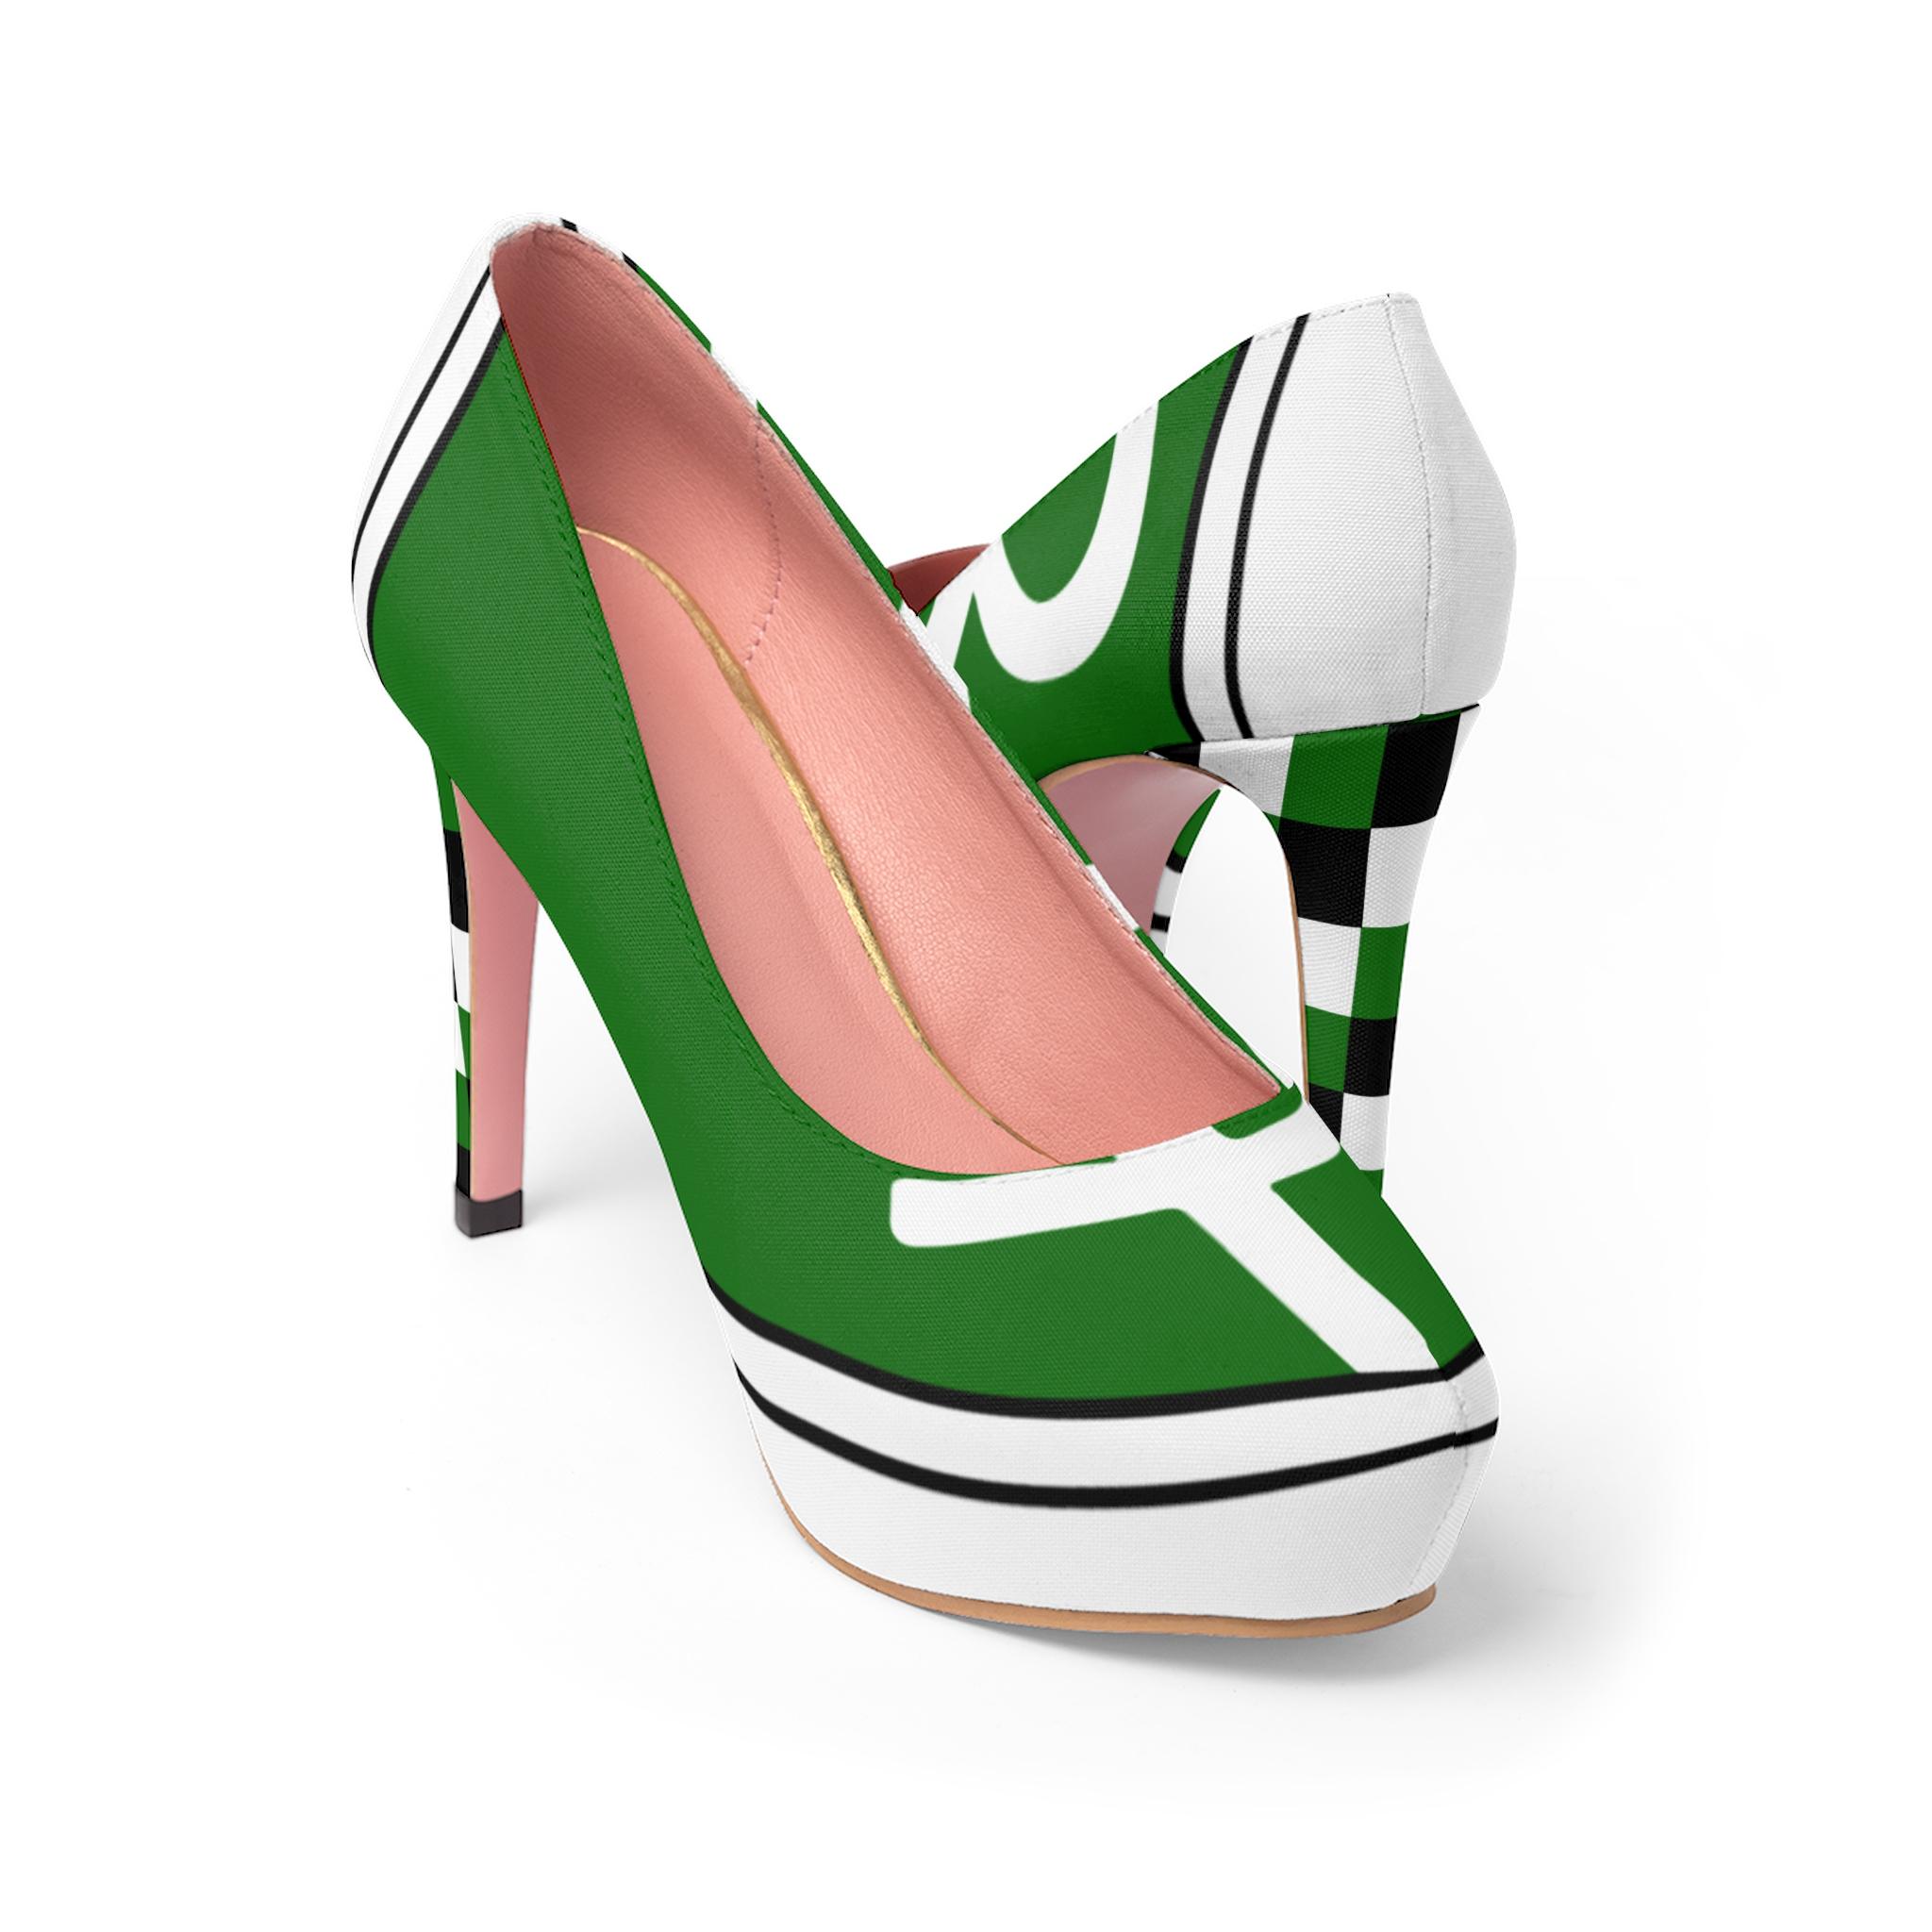 Buissness™ Heels